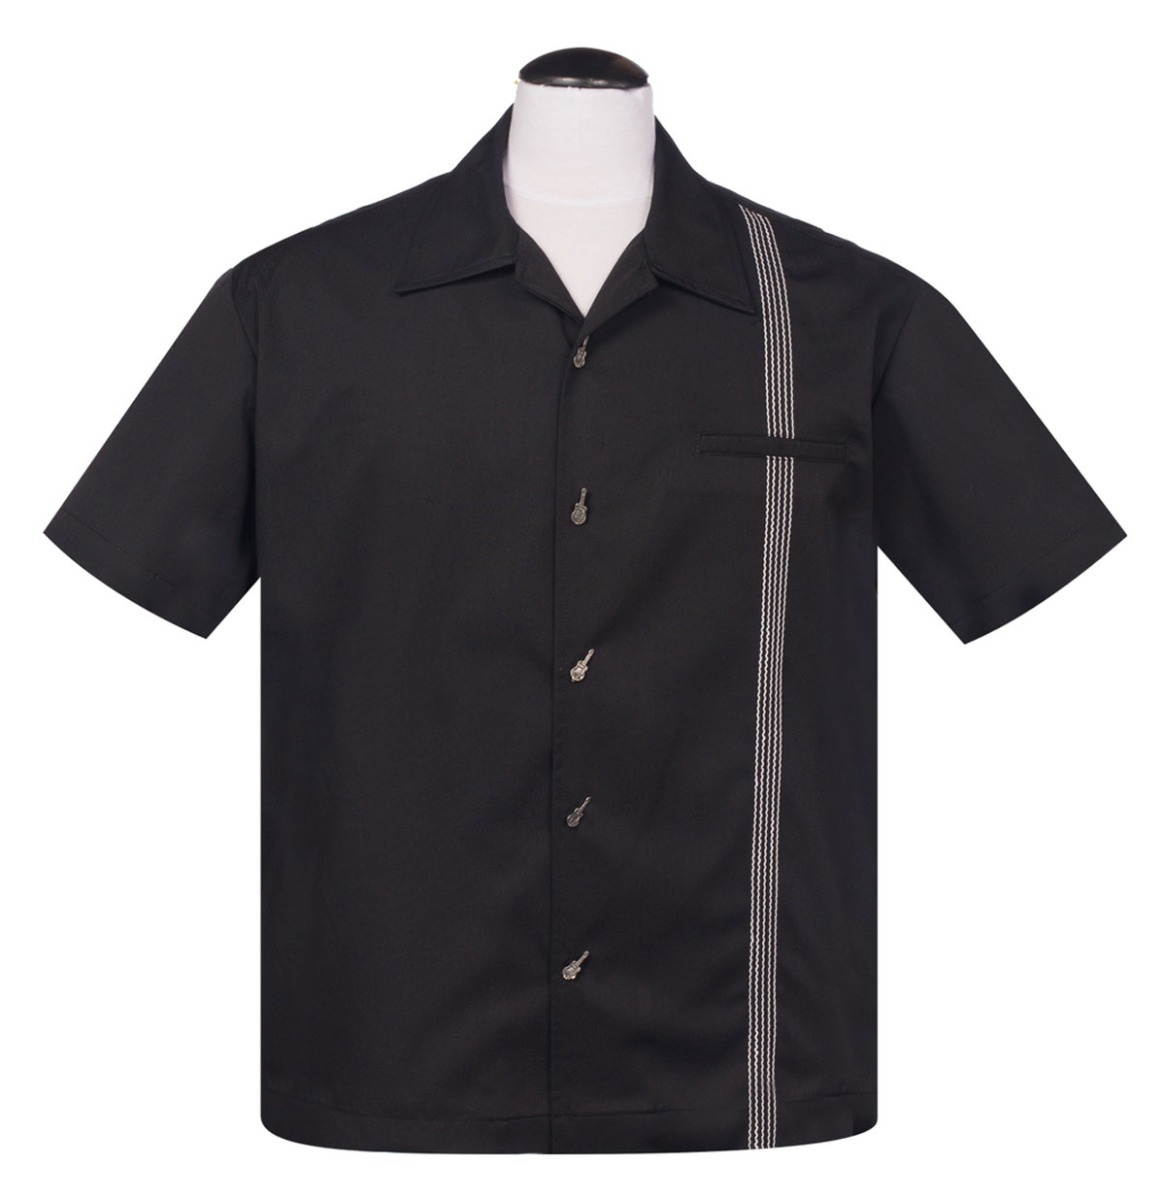 Six String Shirt, Black-White